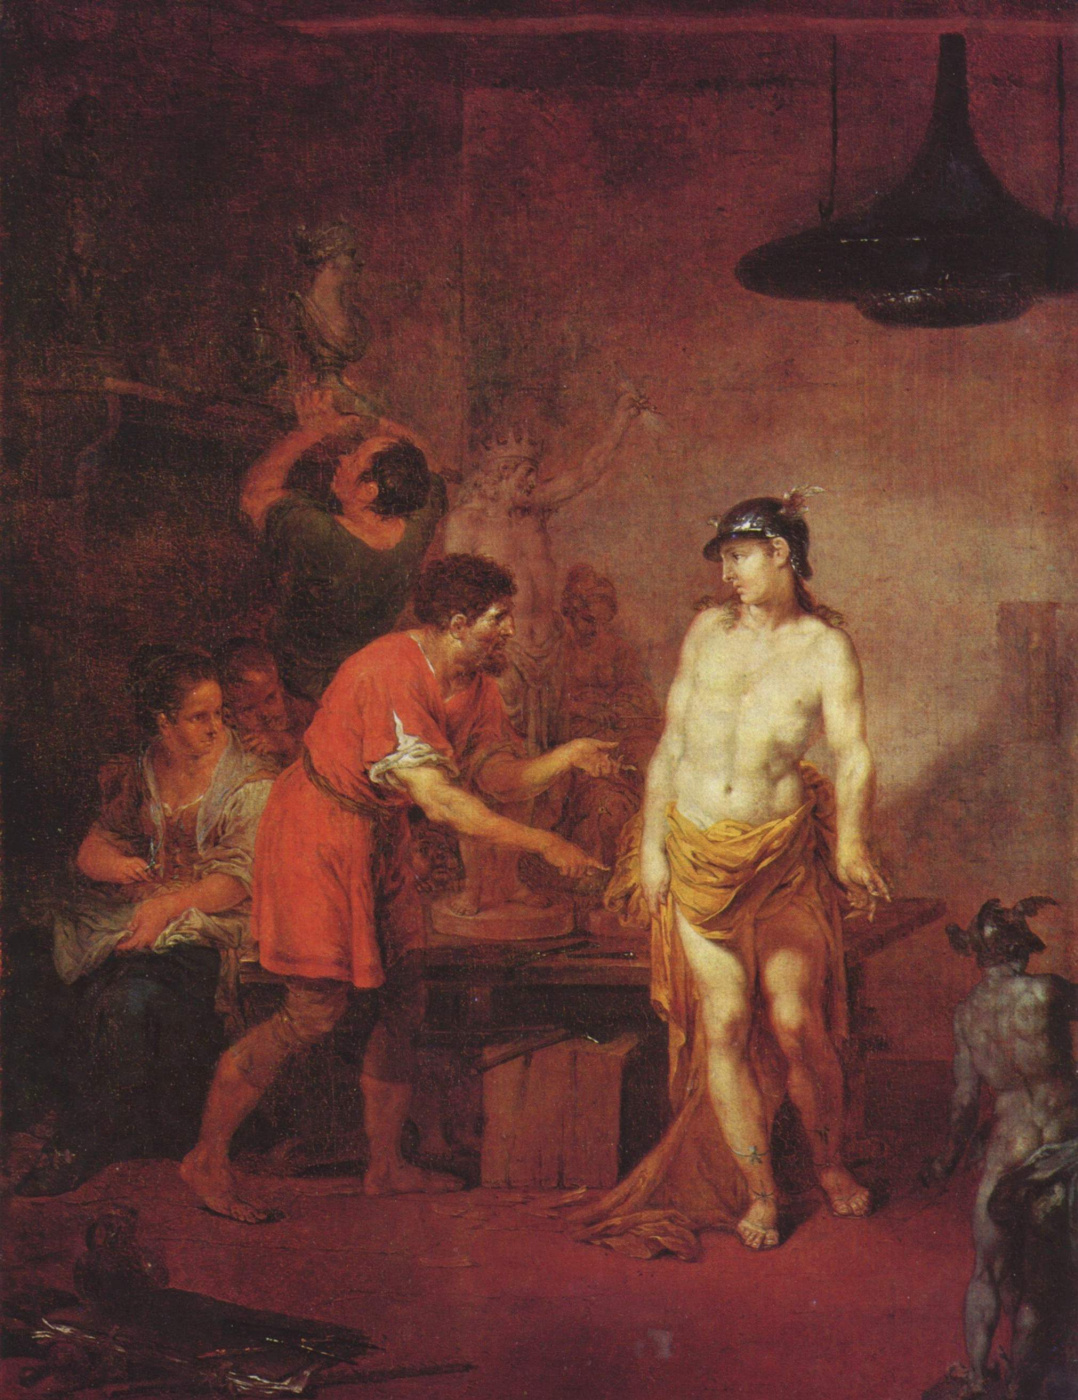 Januarius Cyc. Mercury in the workshop of the sculptor